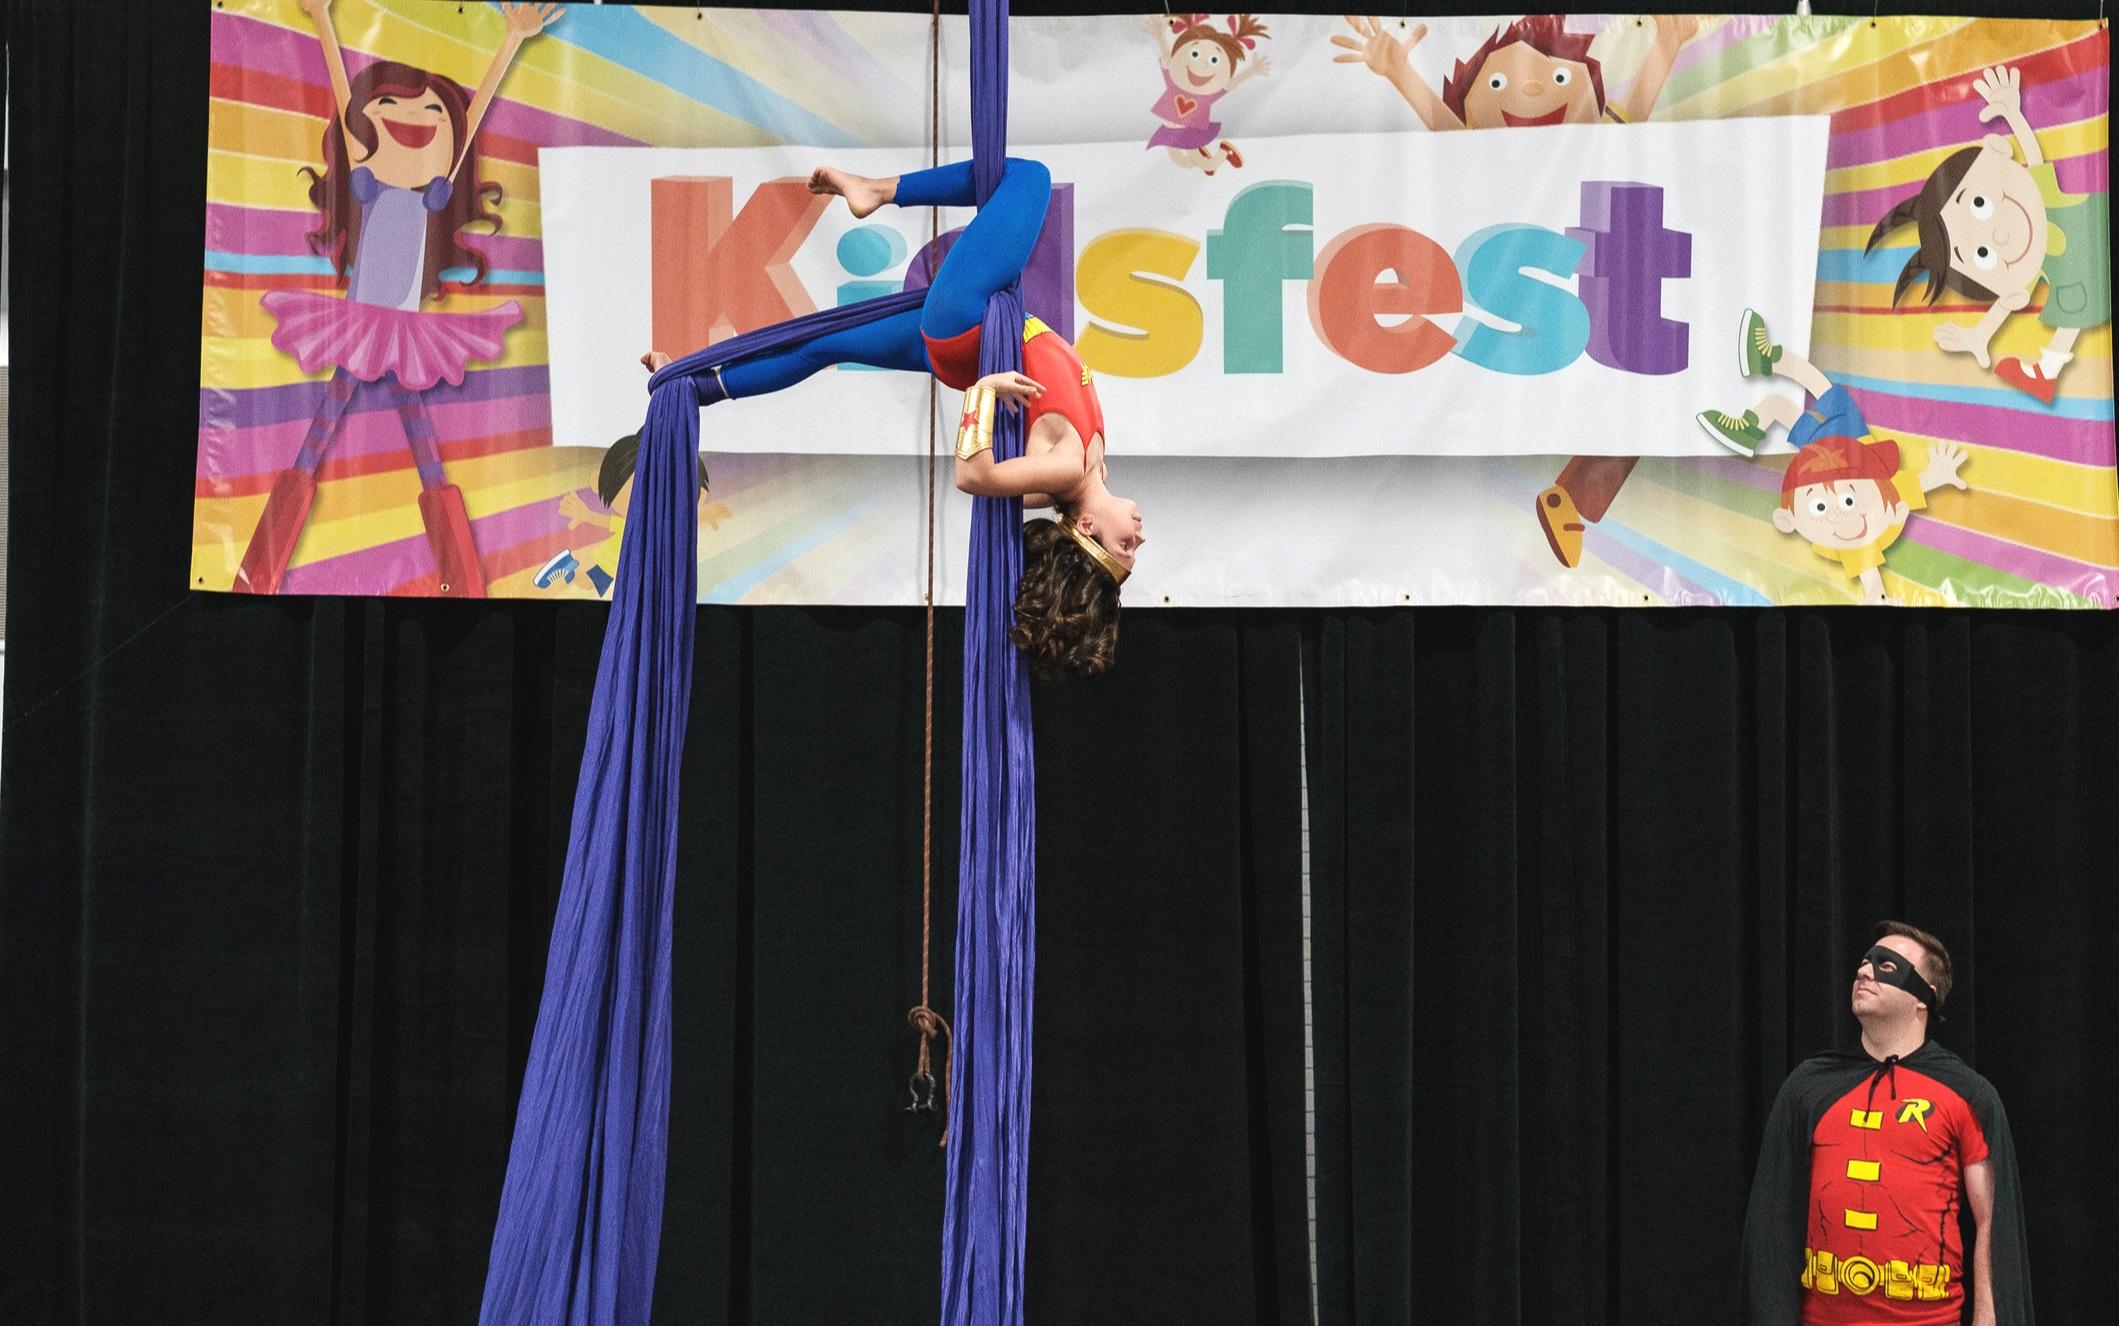 Kidsfest-37.jpg